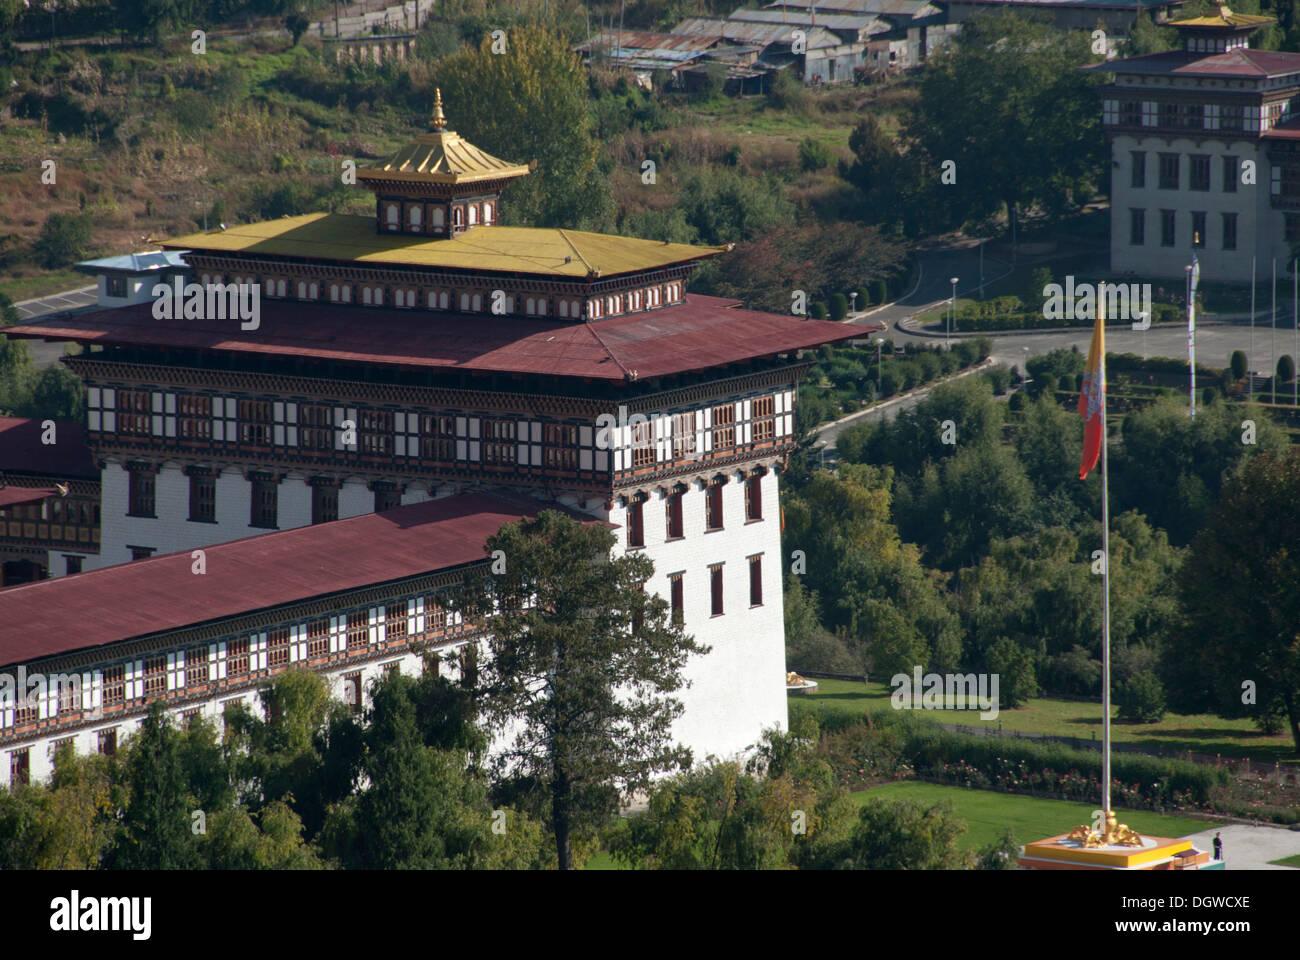 Fortress Monastery of Trashi Chhoe Dzong, seat of government, Thimphu, capital city, Kingdom of Bhutan, South Asia, Stock Photo